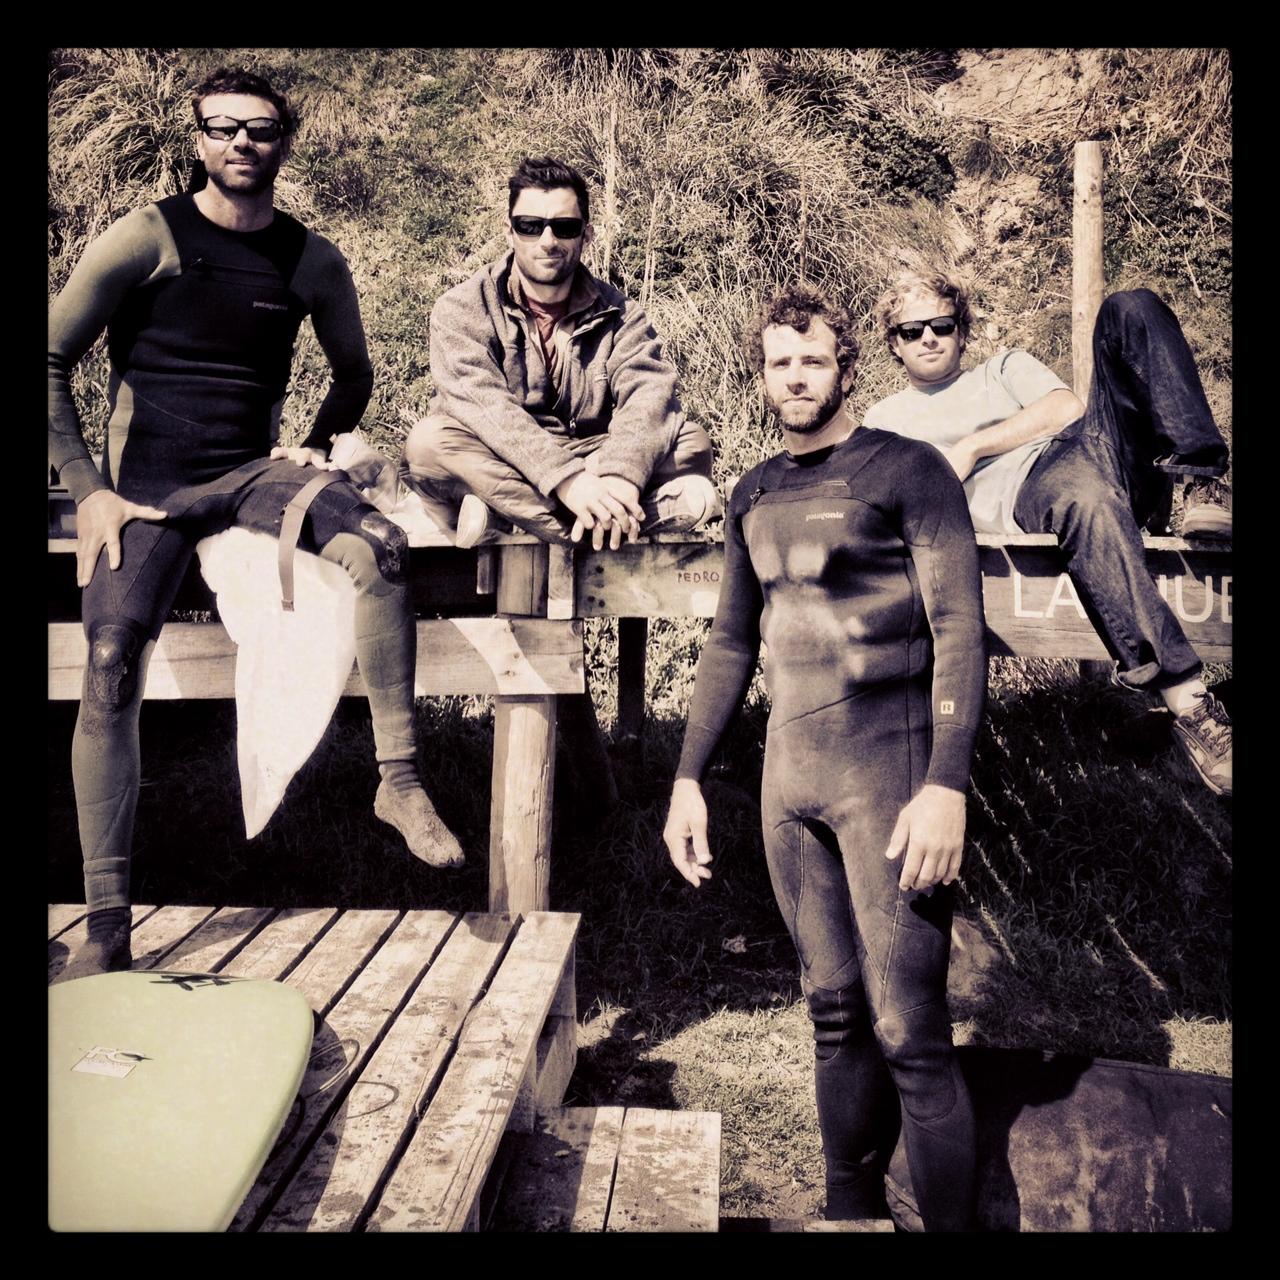 Farias_the_crew